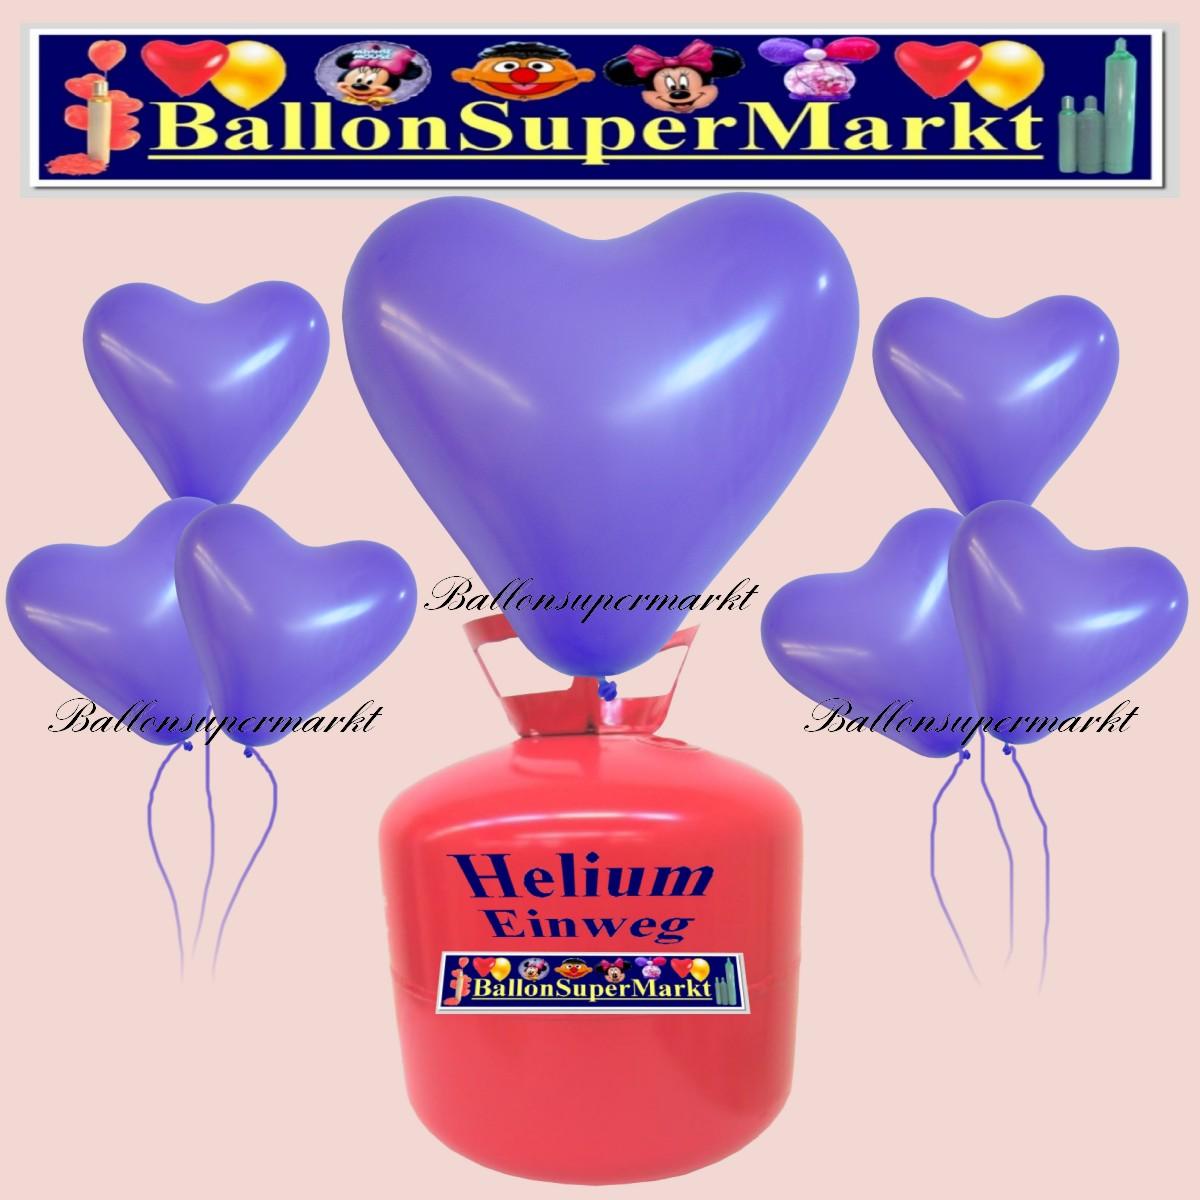 luftballons helium einweg set herzluftballons lila 50 st ck lu hs luftballons helium einweg. Black Bedroom Furniture Sets. Home Design Ideas